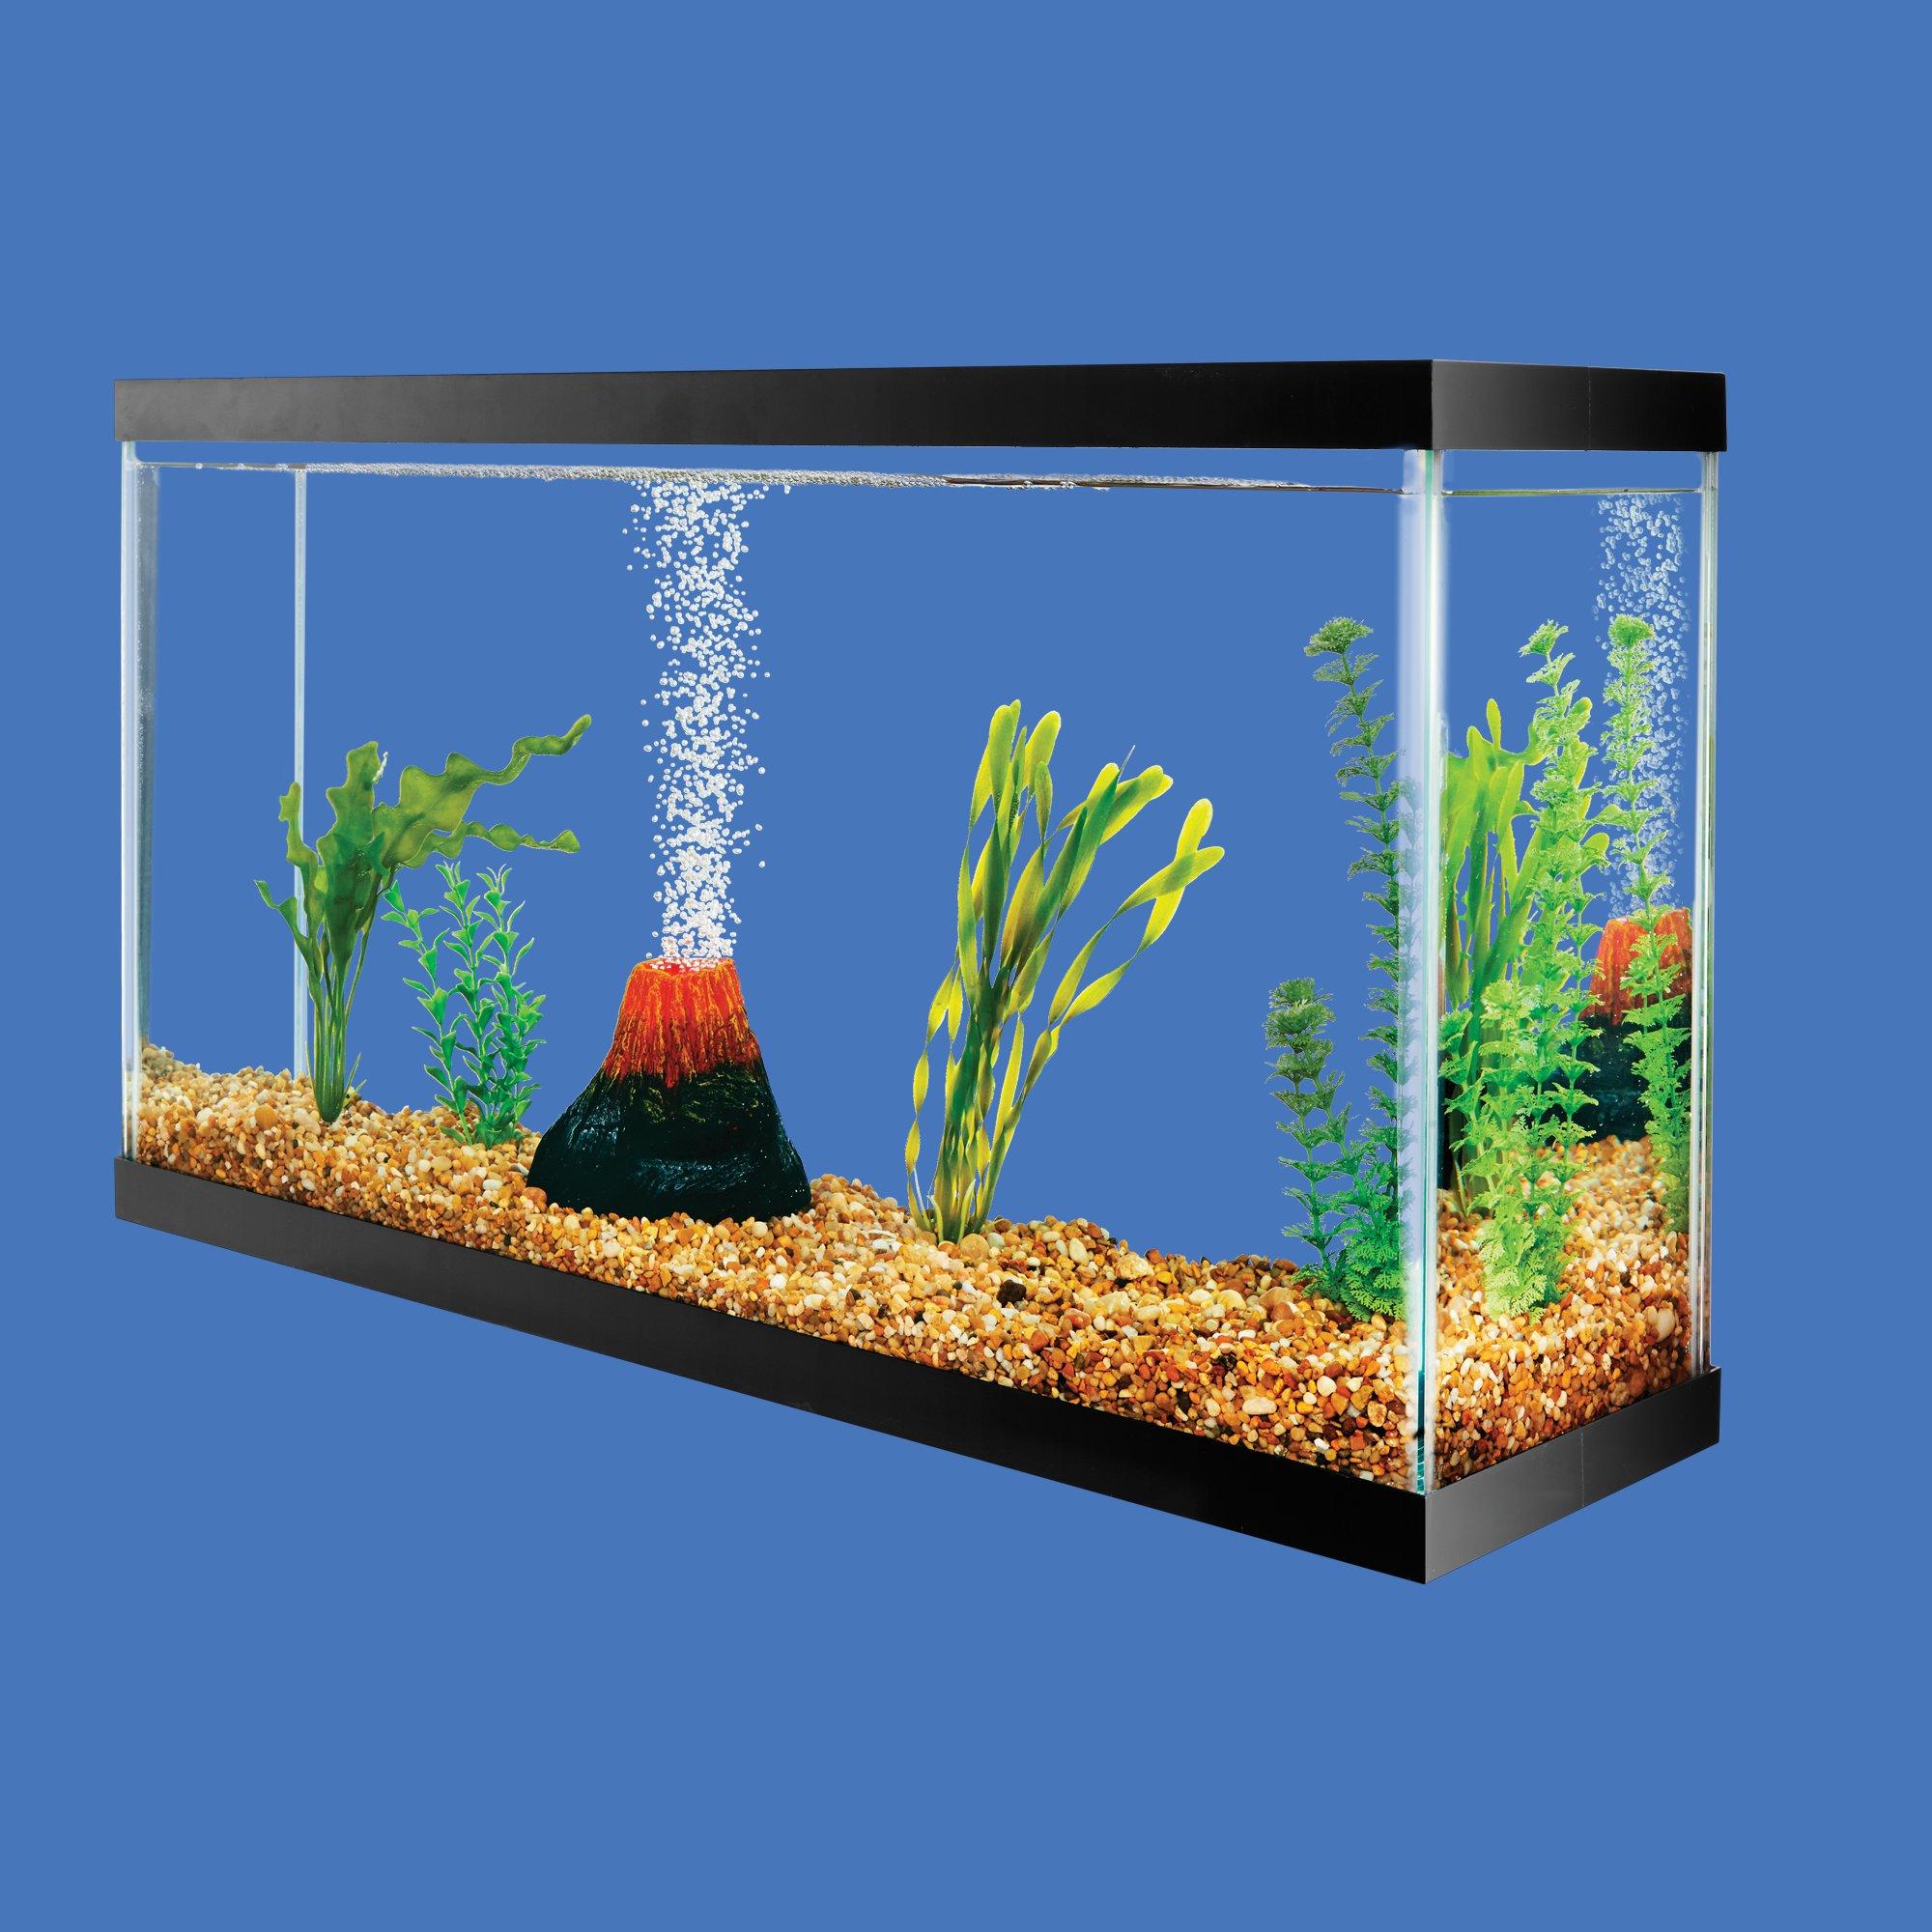 Imagitarium volcano led ornament petco for Petco fish tank decor